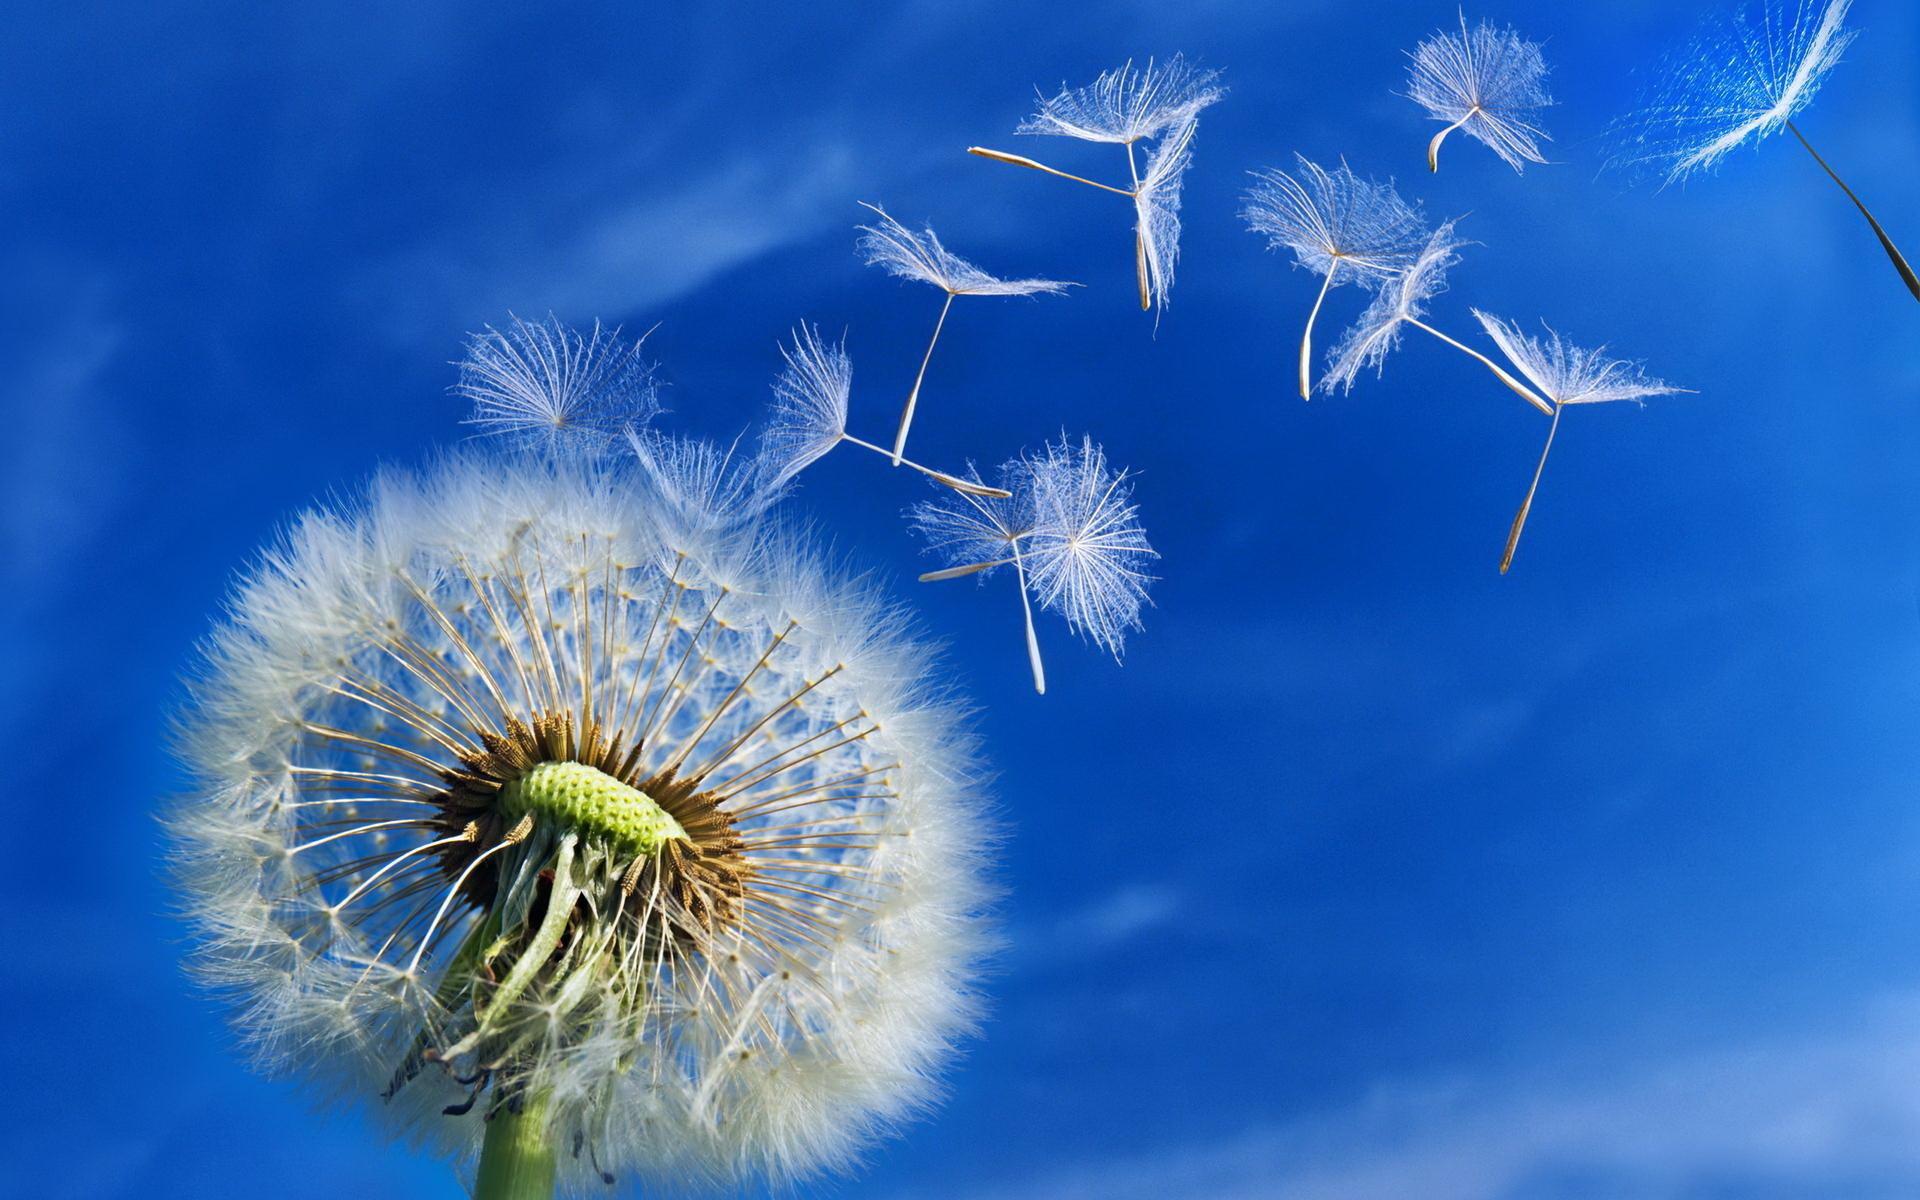 Dandelion Flower Picture